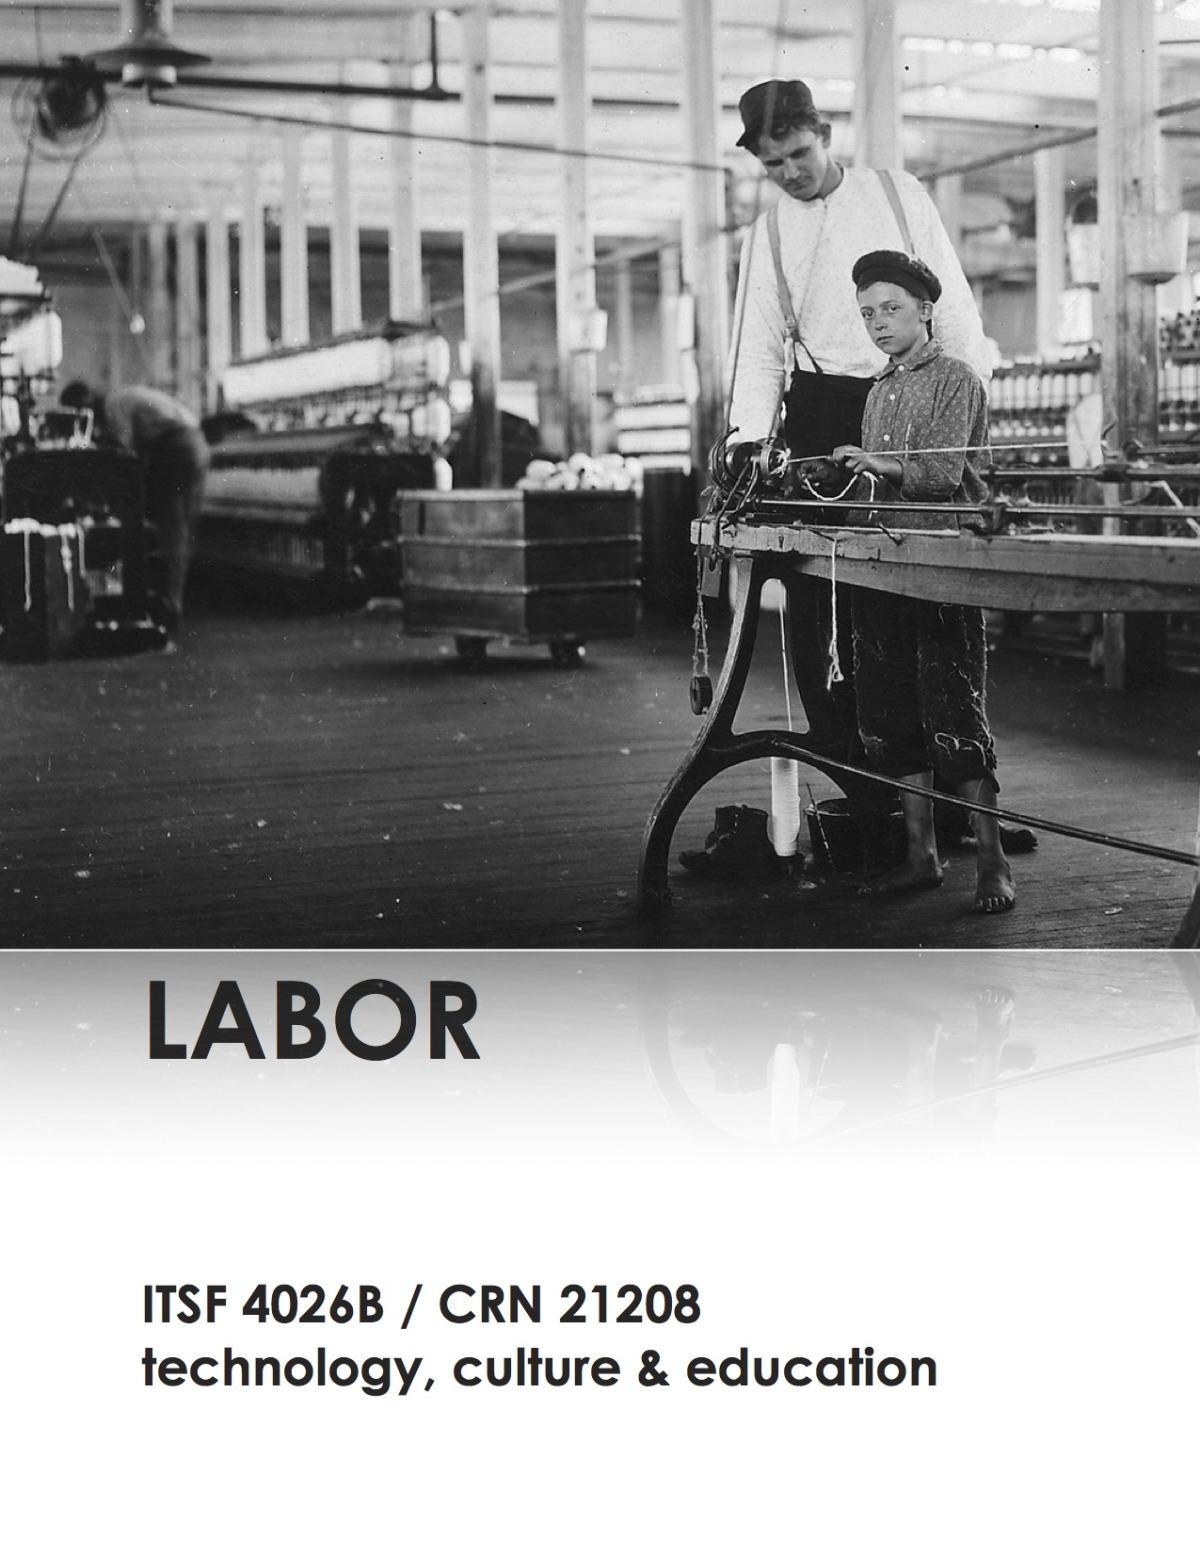 itsf 4026b flyers - labor.jpg